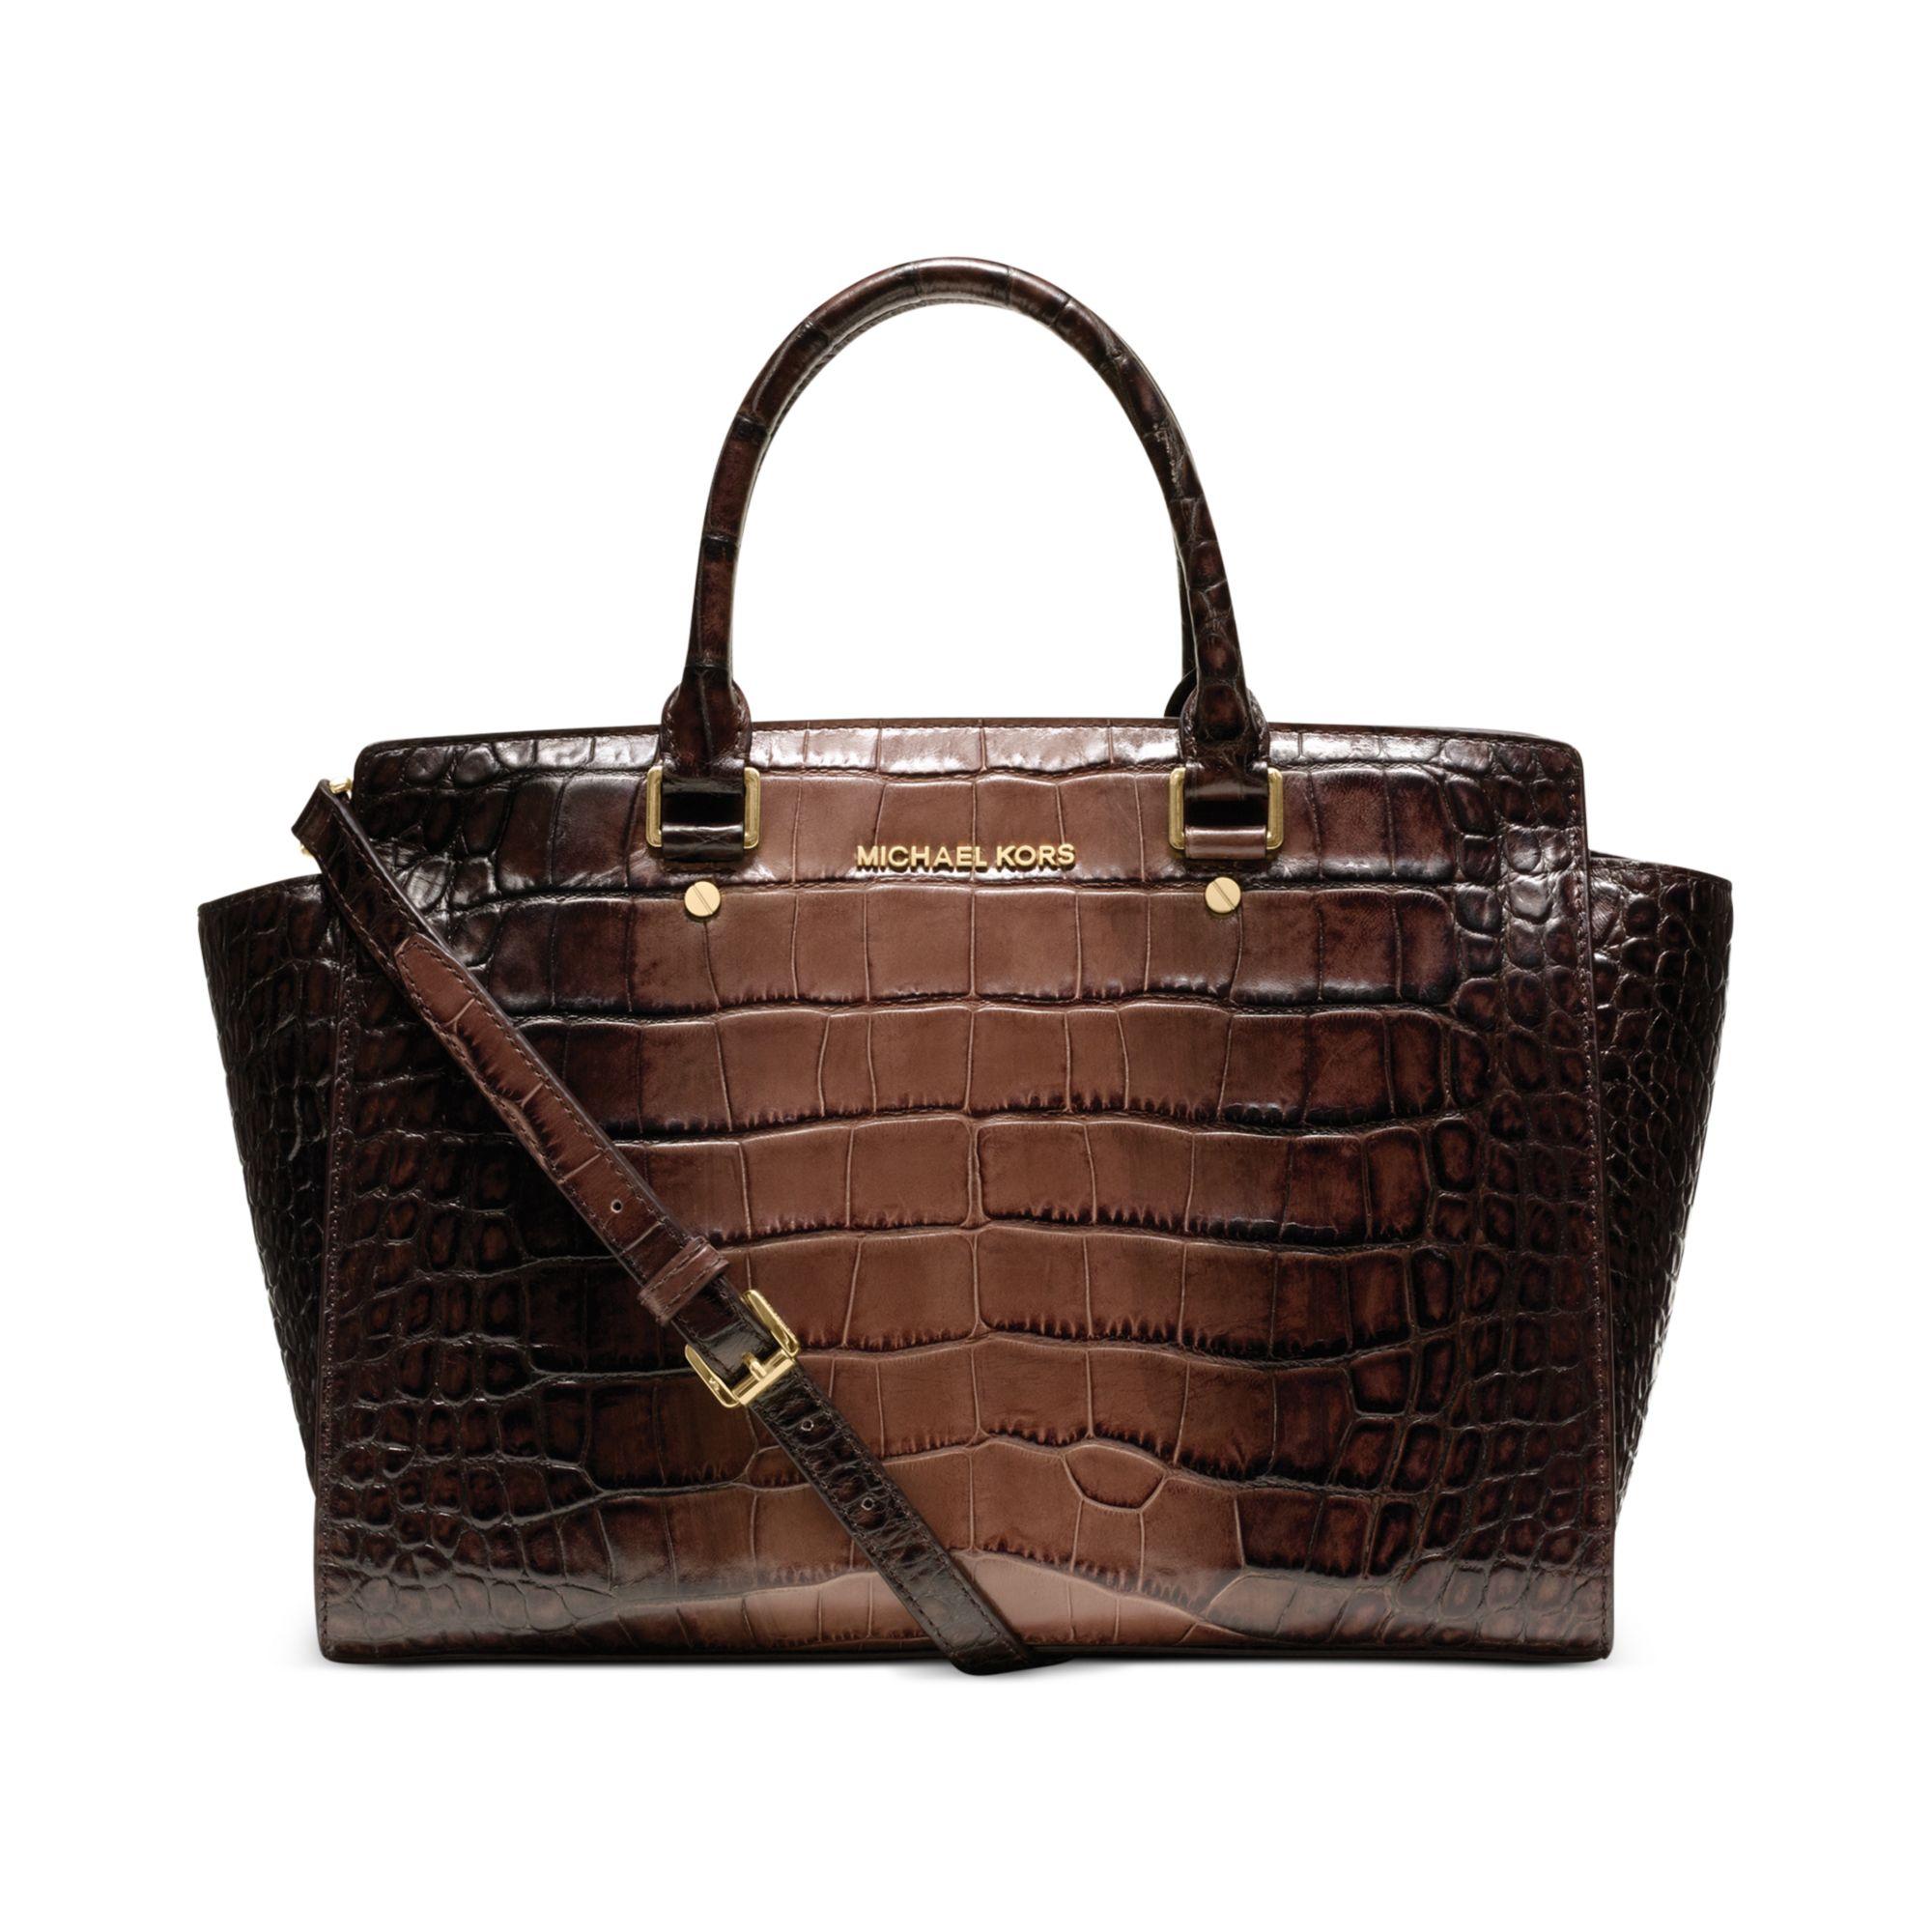 michael kors selma large croco satchel in brown lyst. Black Bedroom Furniture Sets. Home Design Ideas